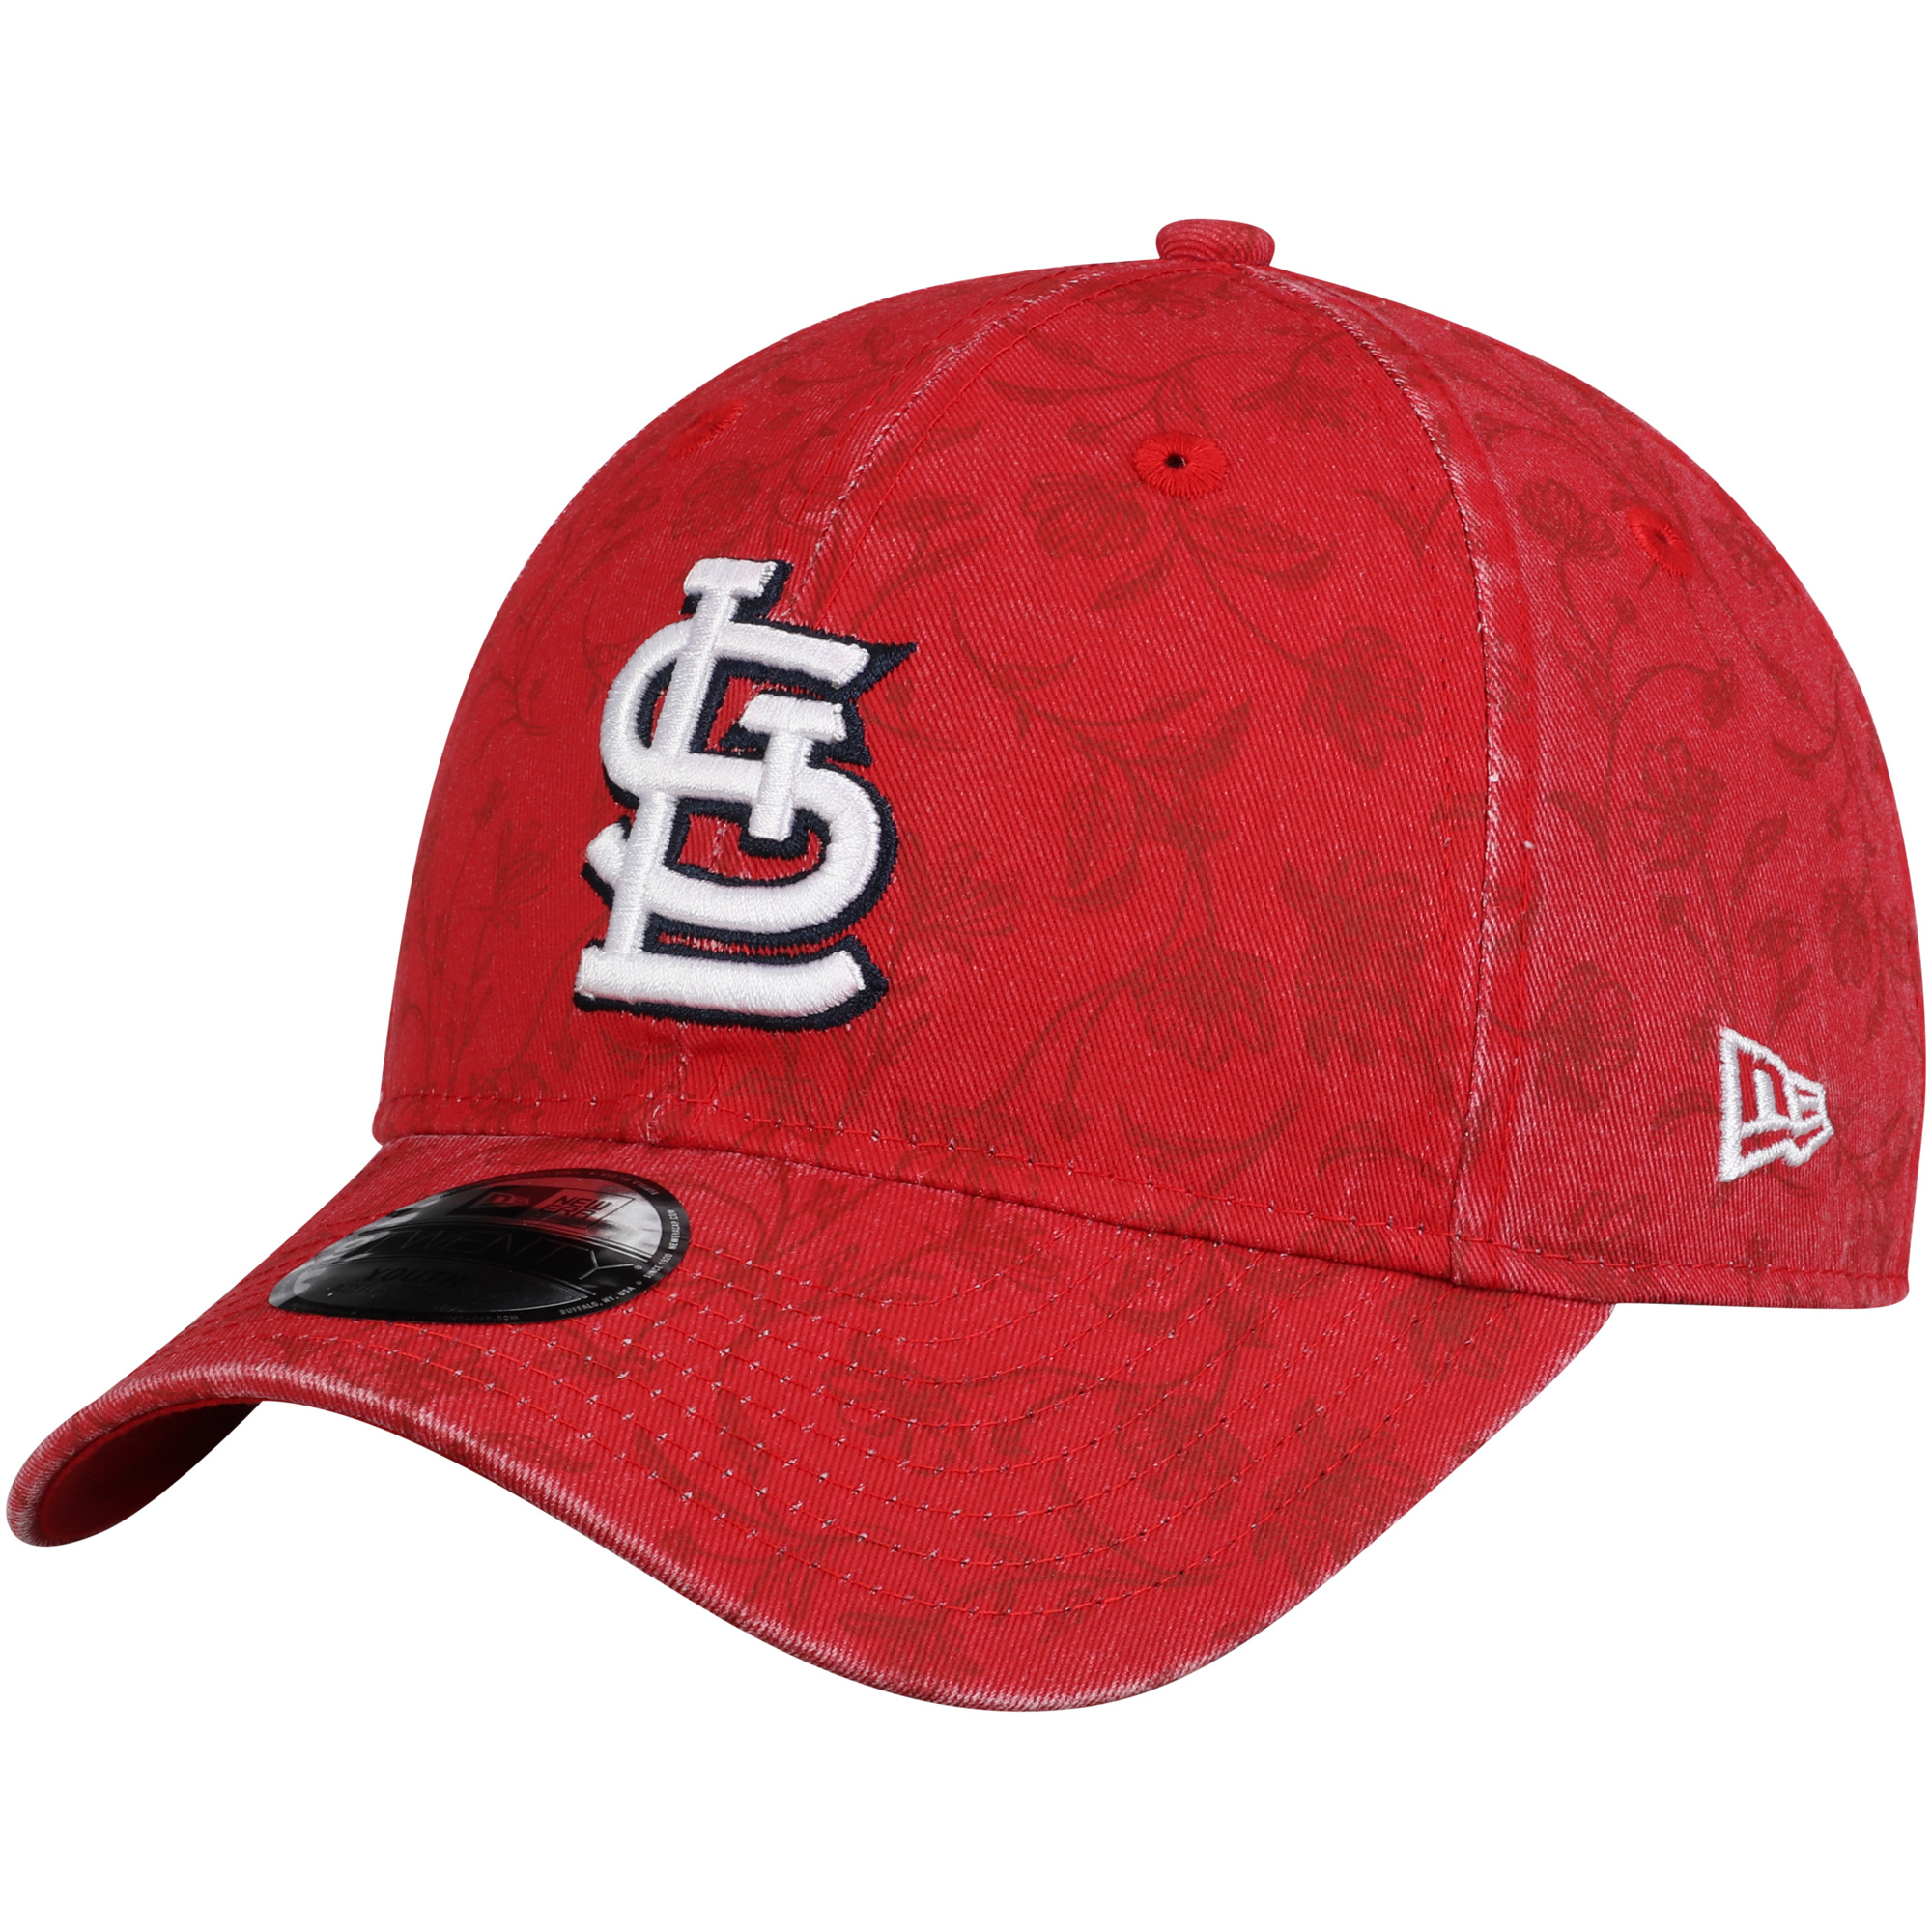 St. Louis Cardinals New Era Girls Youth Floral Peek 9TWENTY Adjustable Hat - Red - OSFA